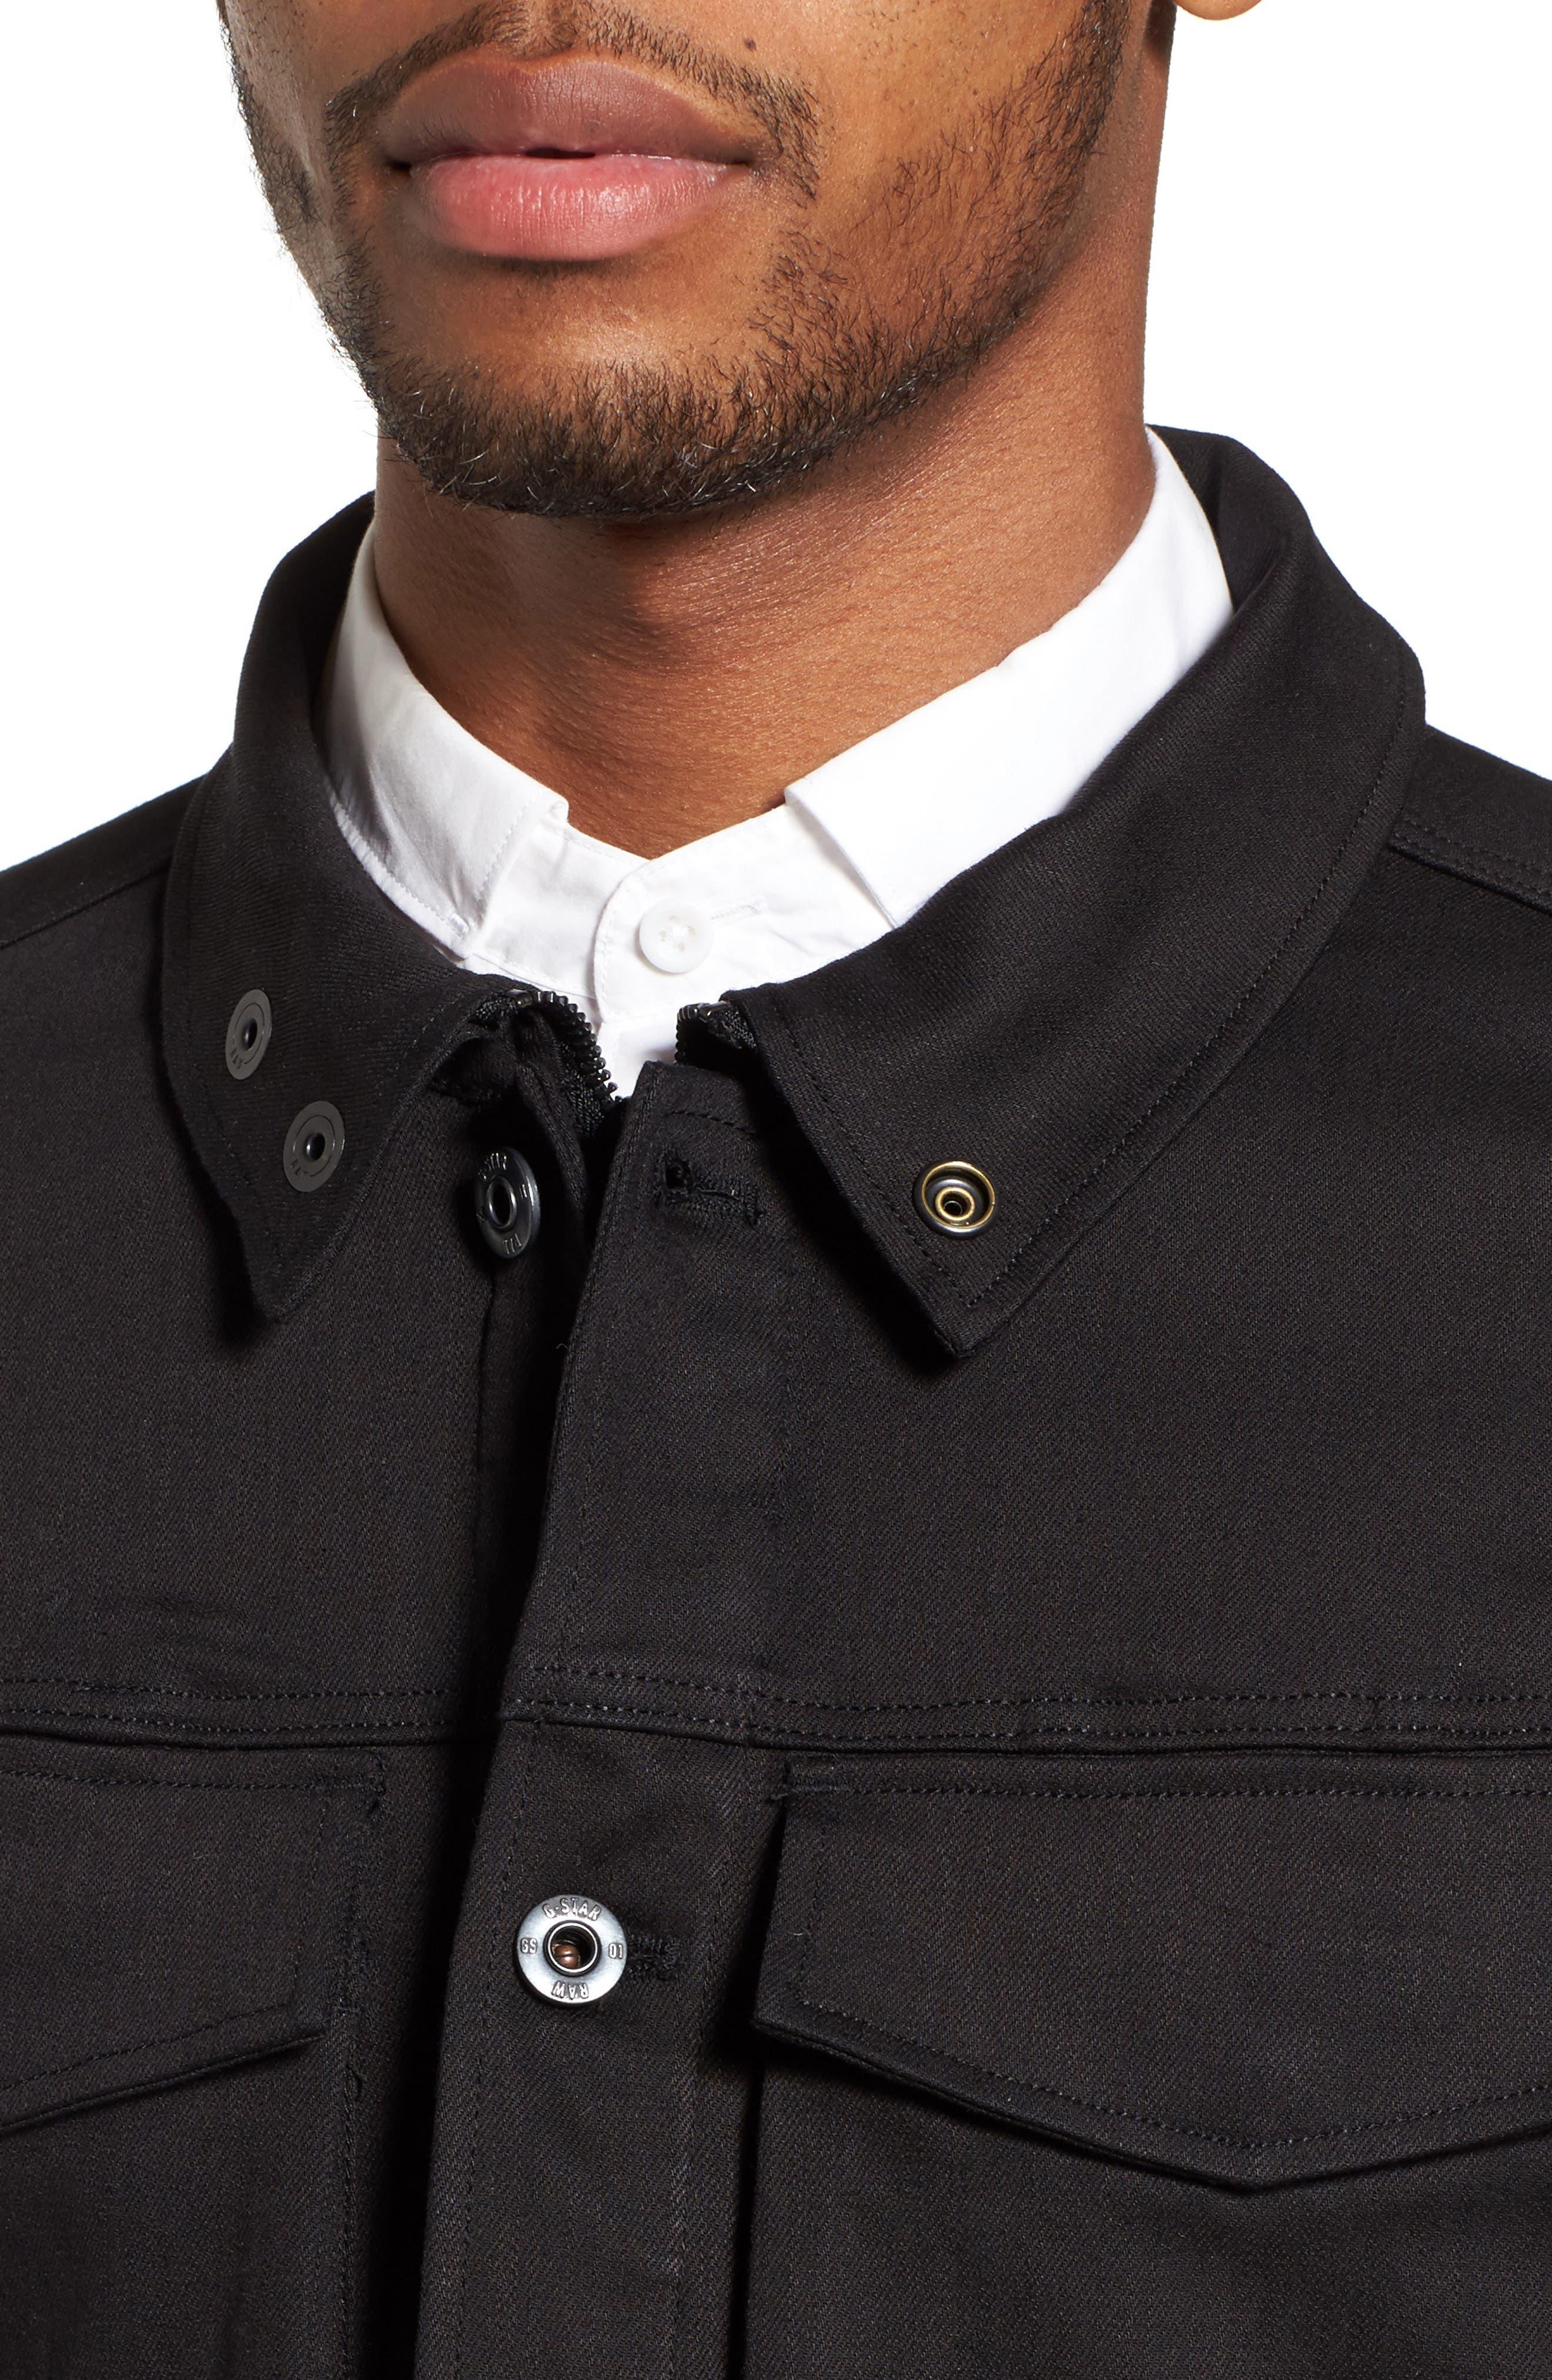 Vodan 3D Slim Jacket,                             Alternate thumbnail 4, color,                             401